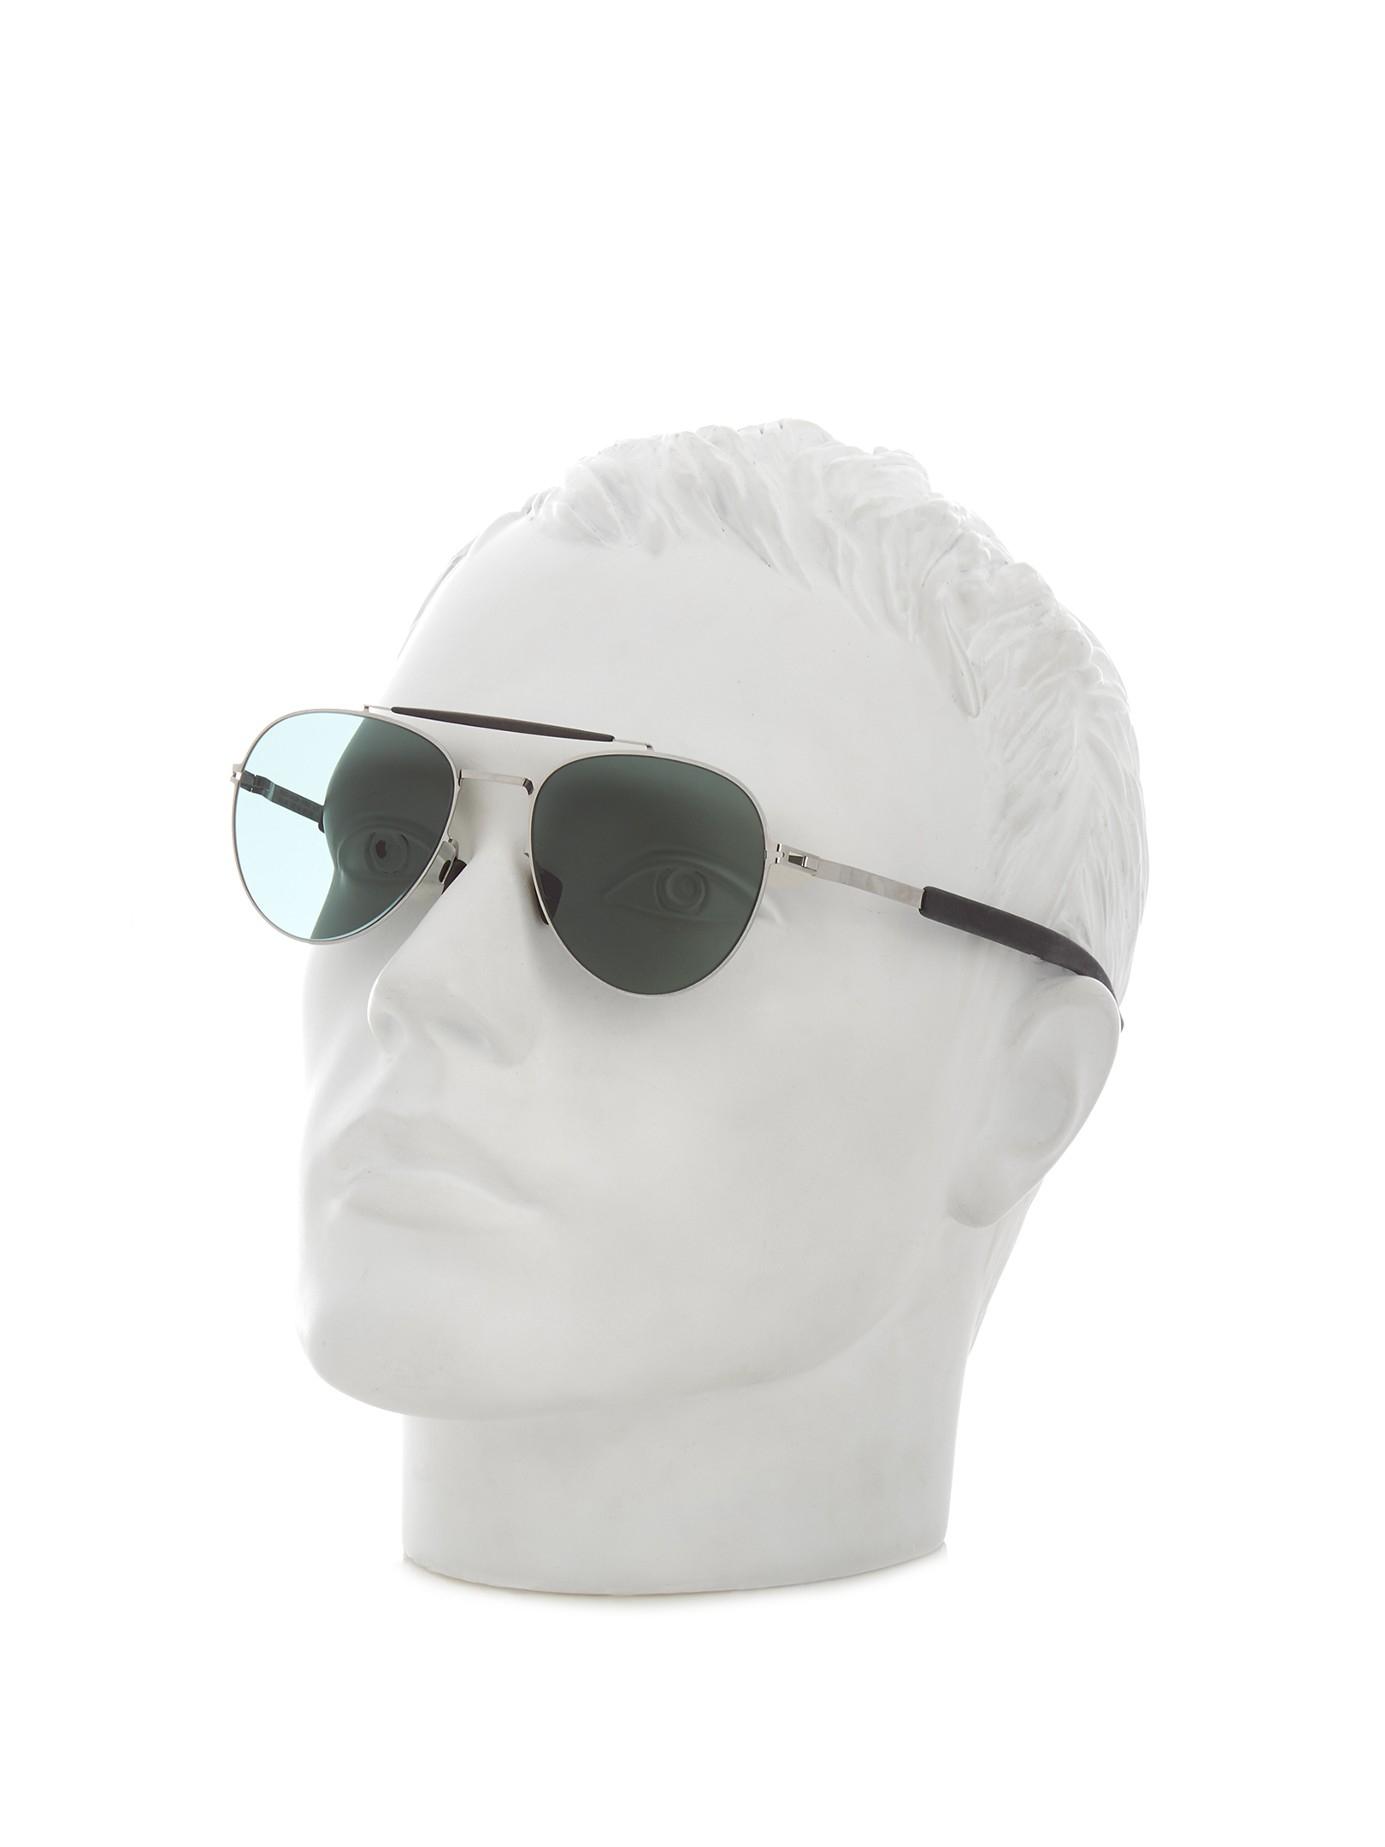 Mykita Mylon Sloe Stainless-steel Aviator Sunglasses in Silver (Metallic) for Men